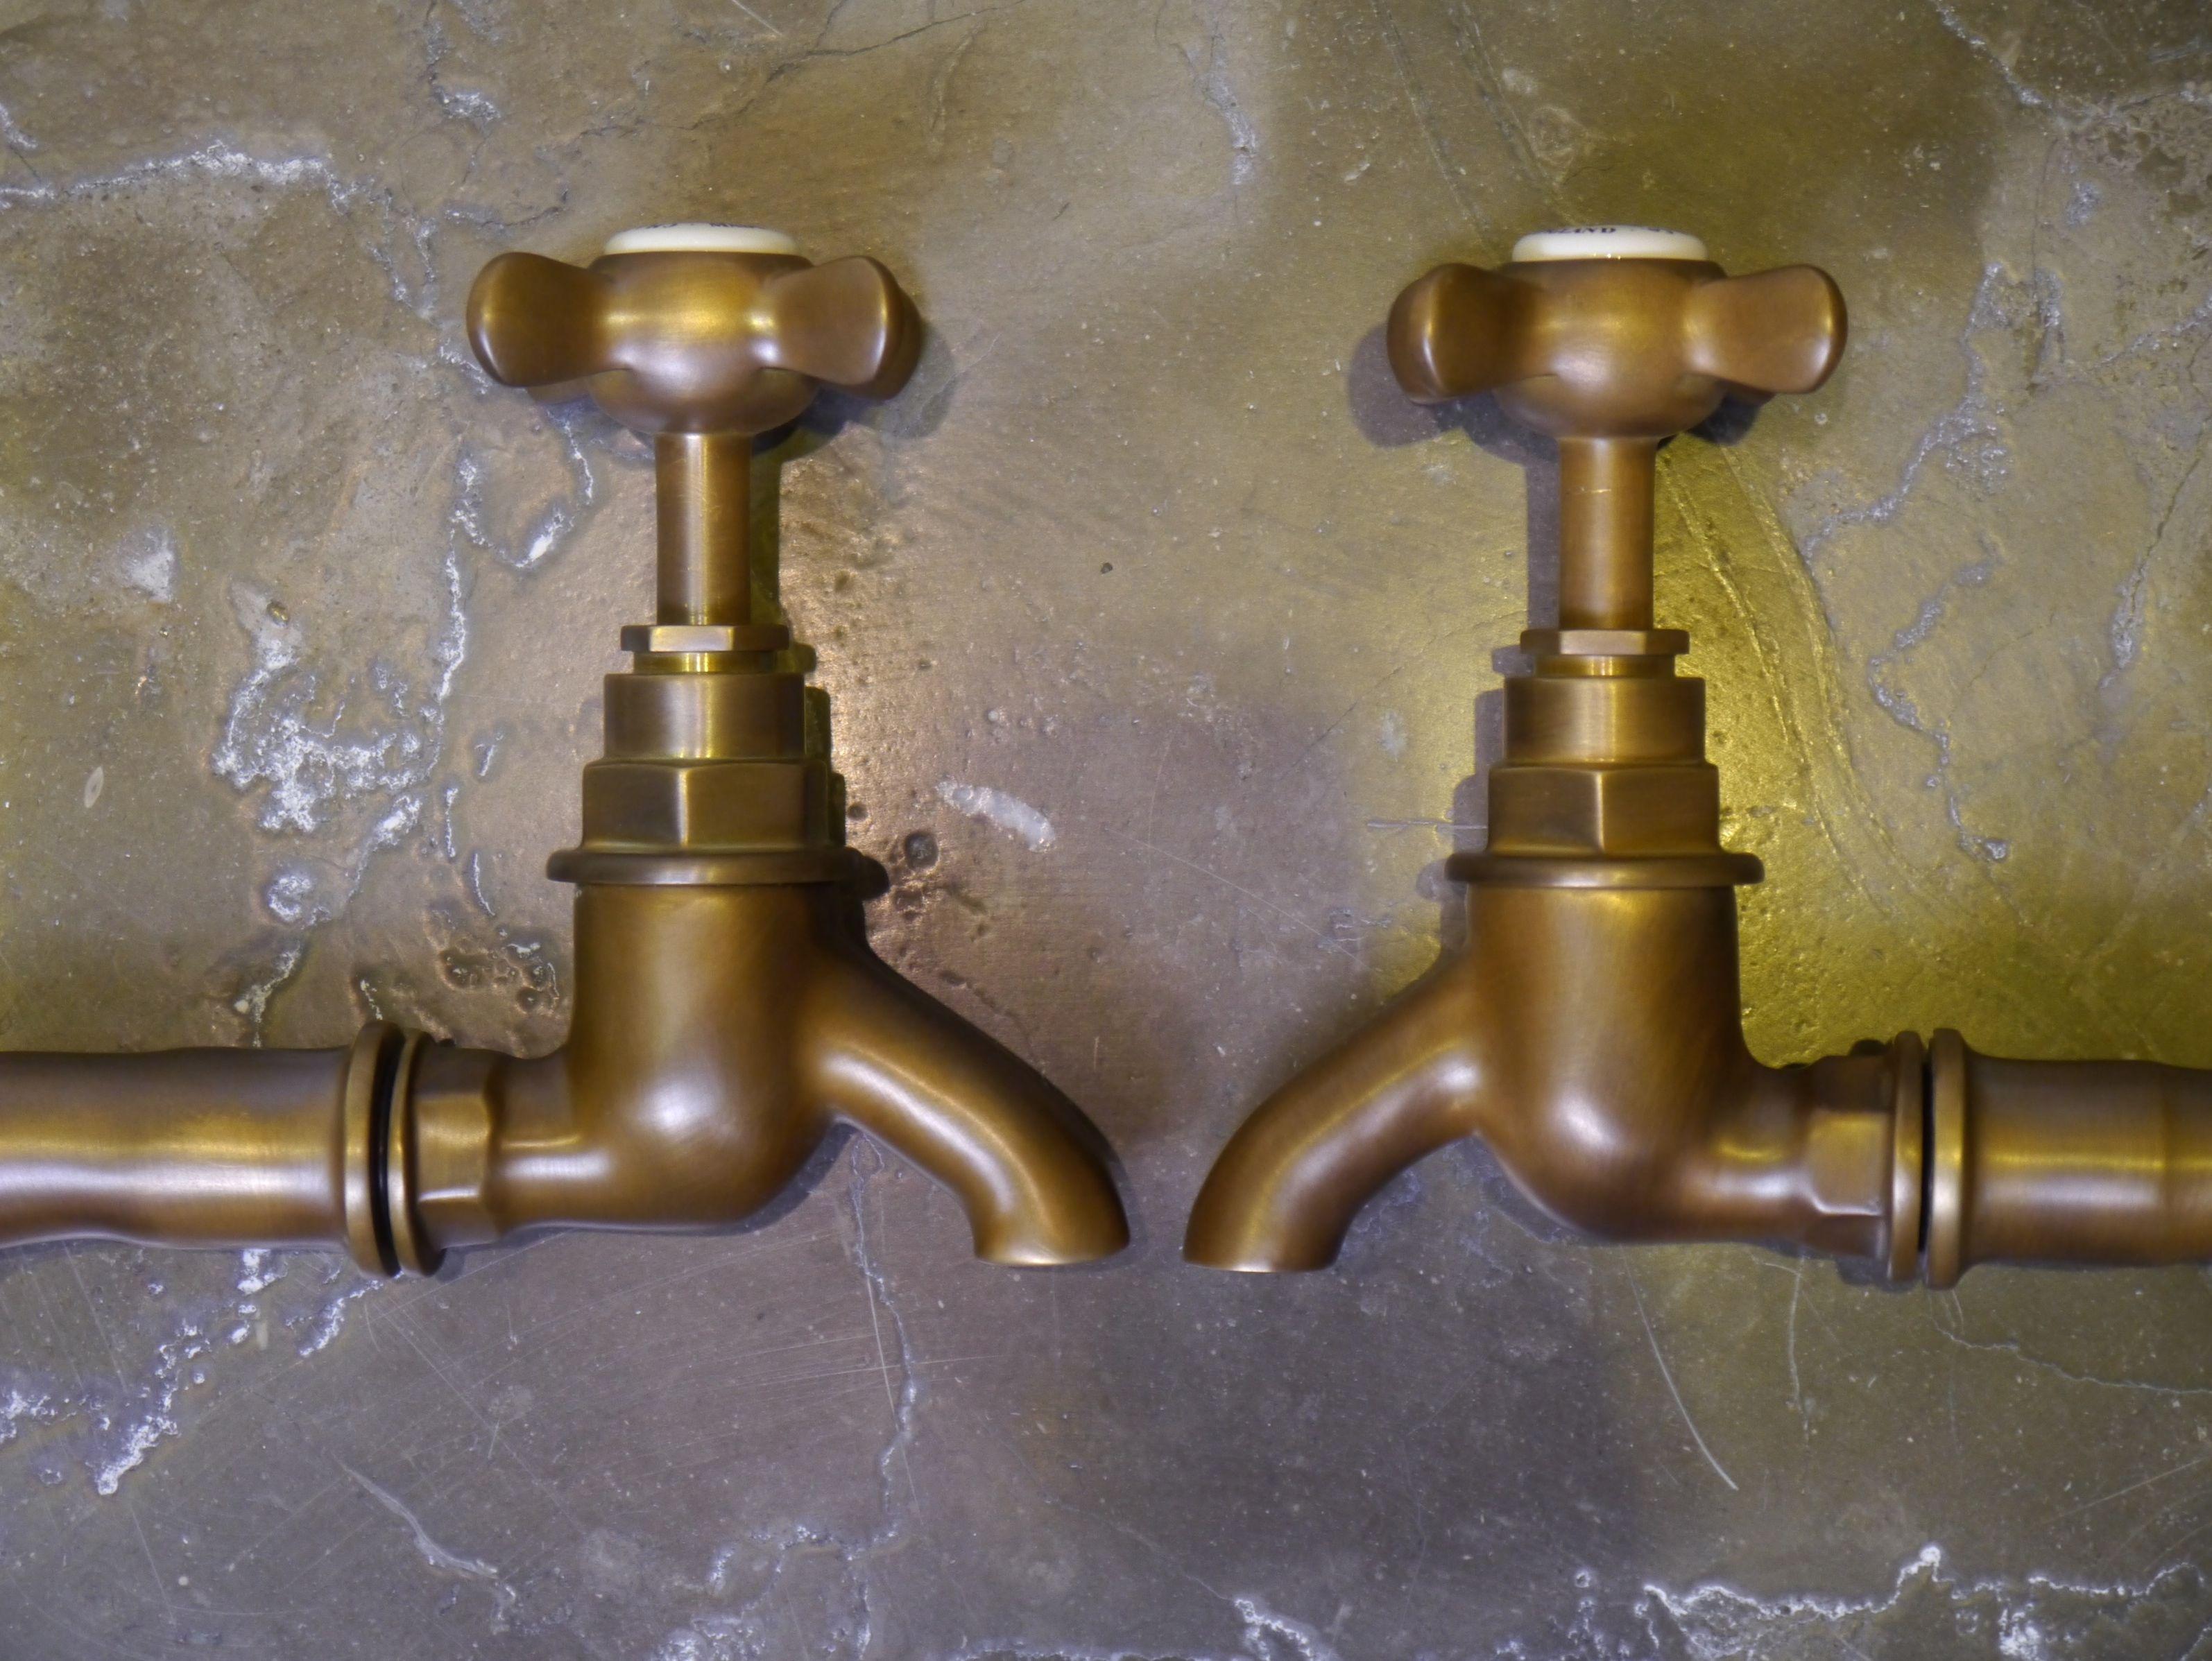 weathered brass brushed brass antique brass bib taps chadder amp cos bib taps: perrin rowe lifestyle